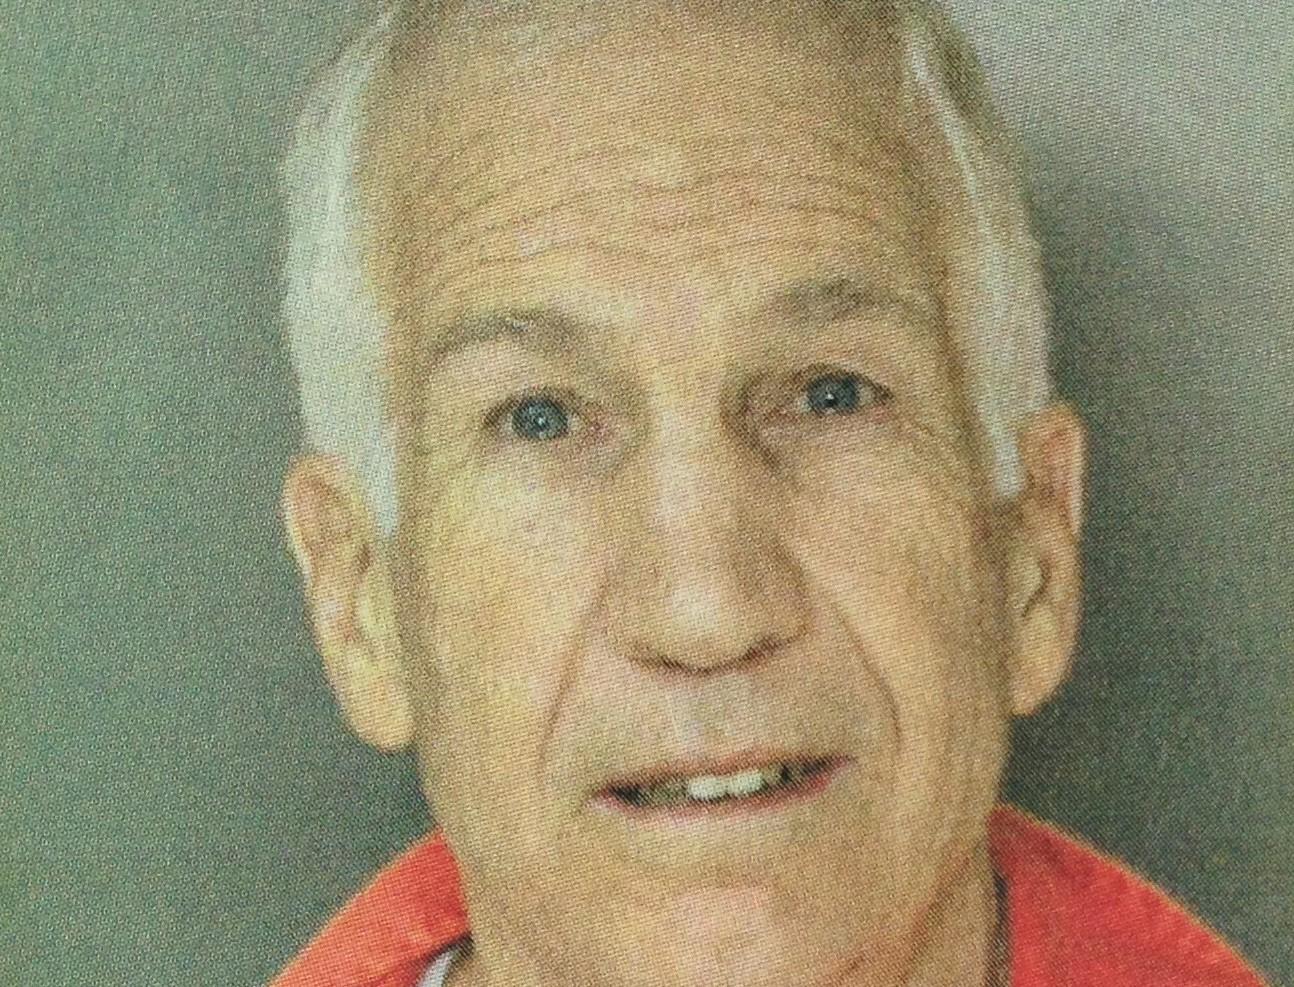 Jerry Sandusky State Prison Mug Shot